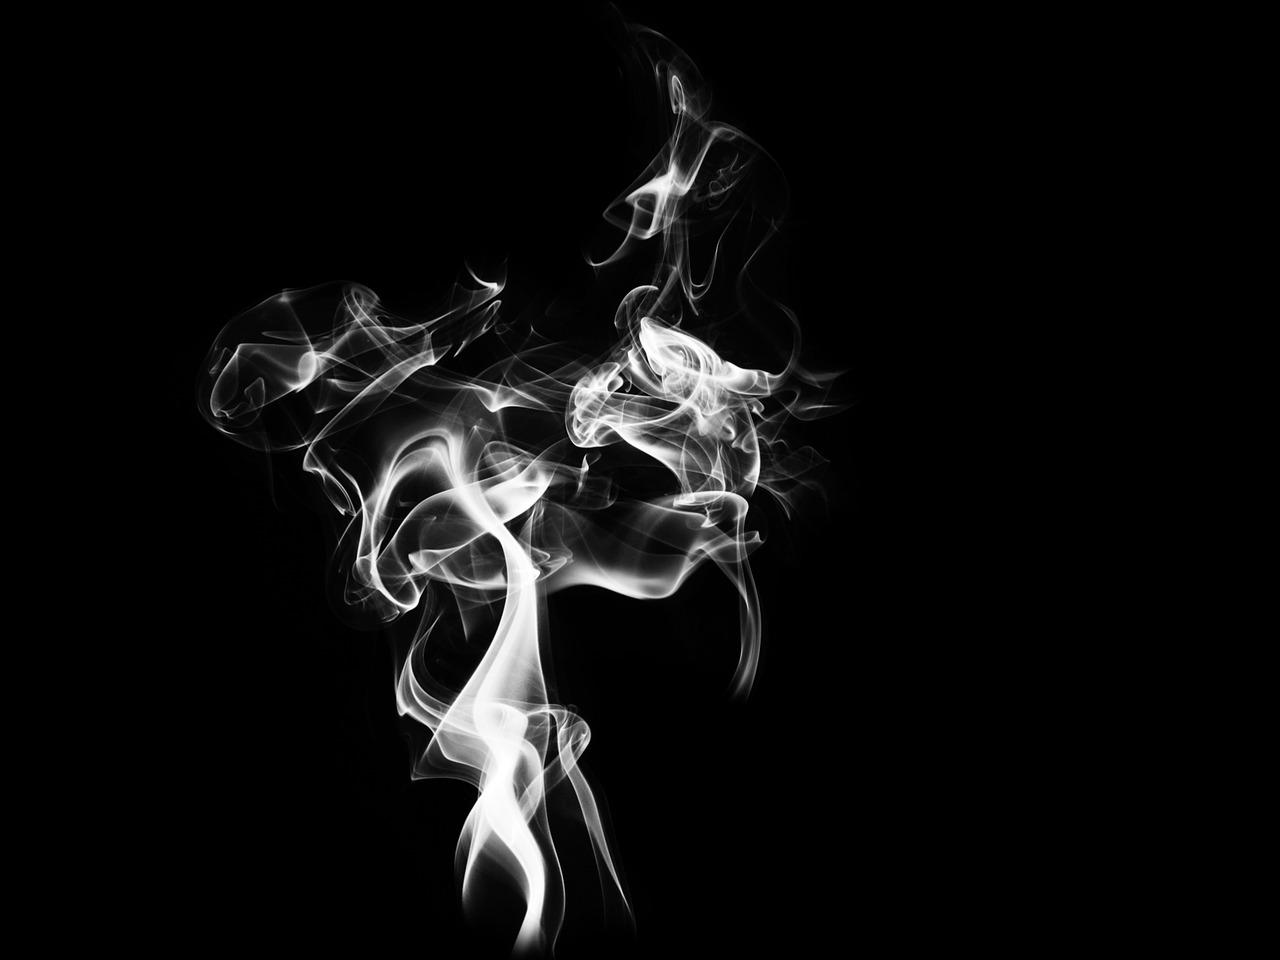 Teknik Fotografi Smoke Art Photography